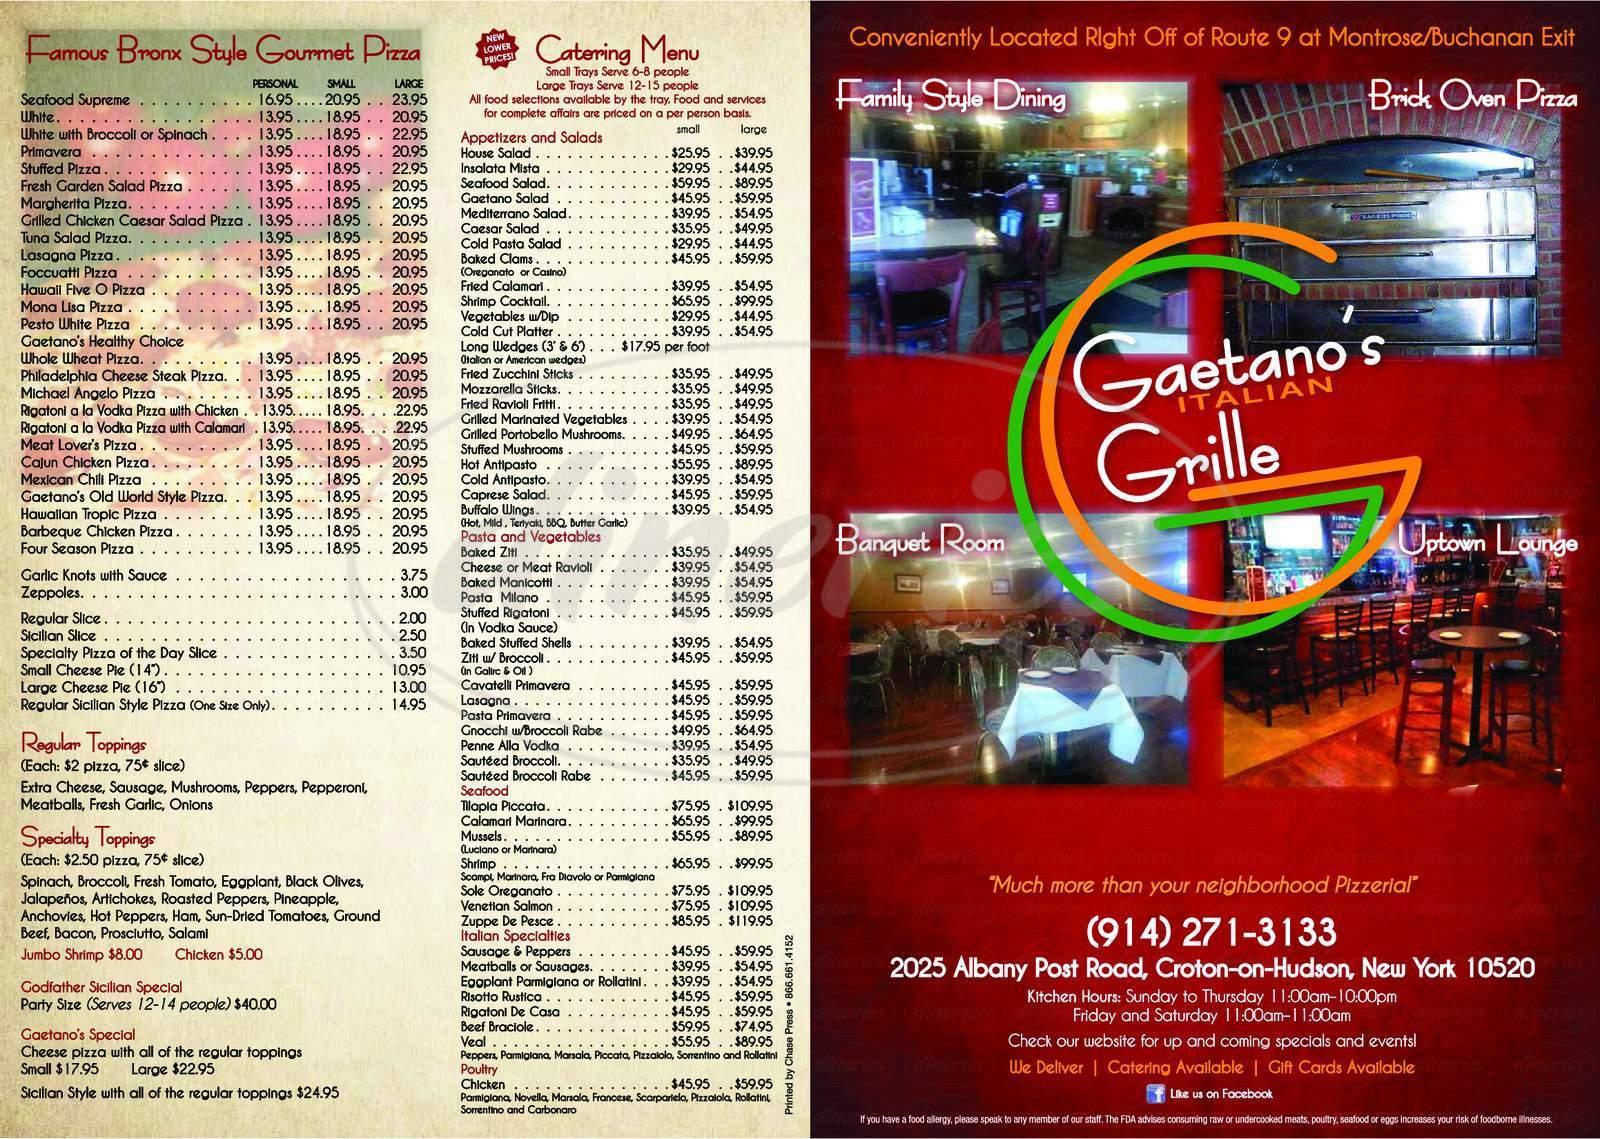 menu for Gaetanos Grill